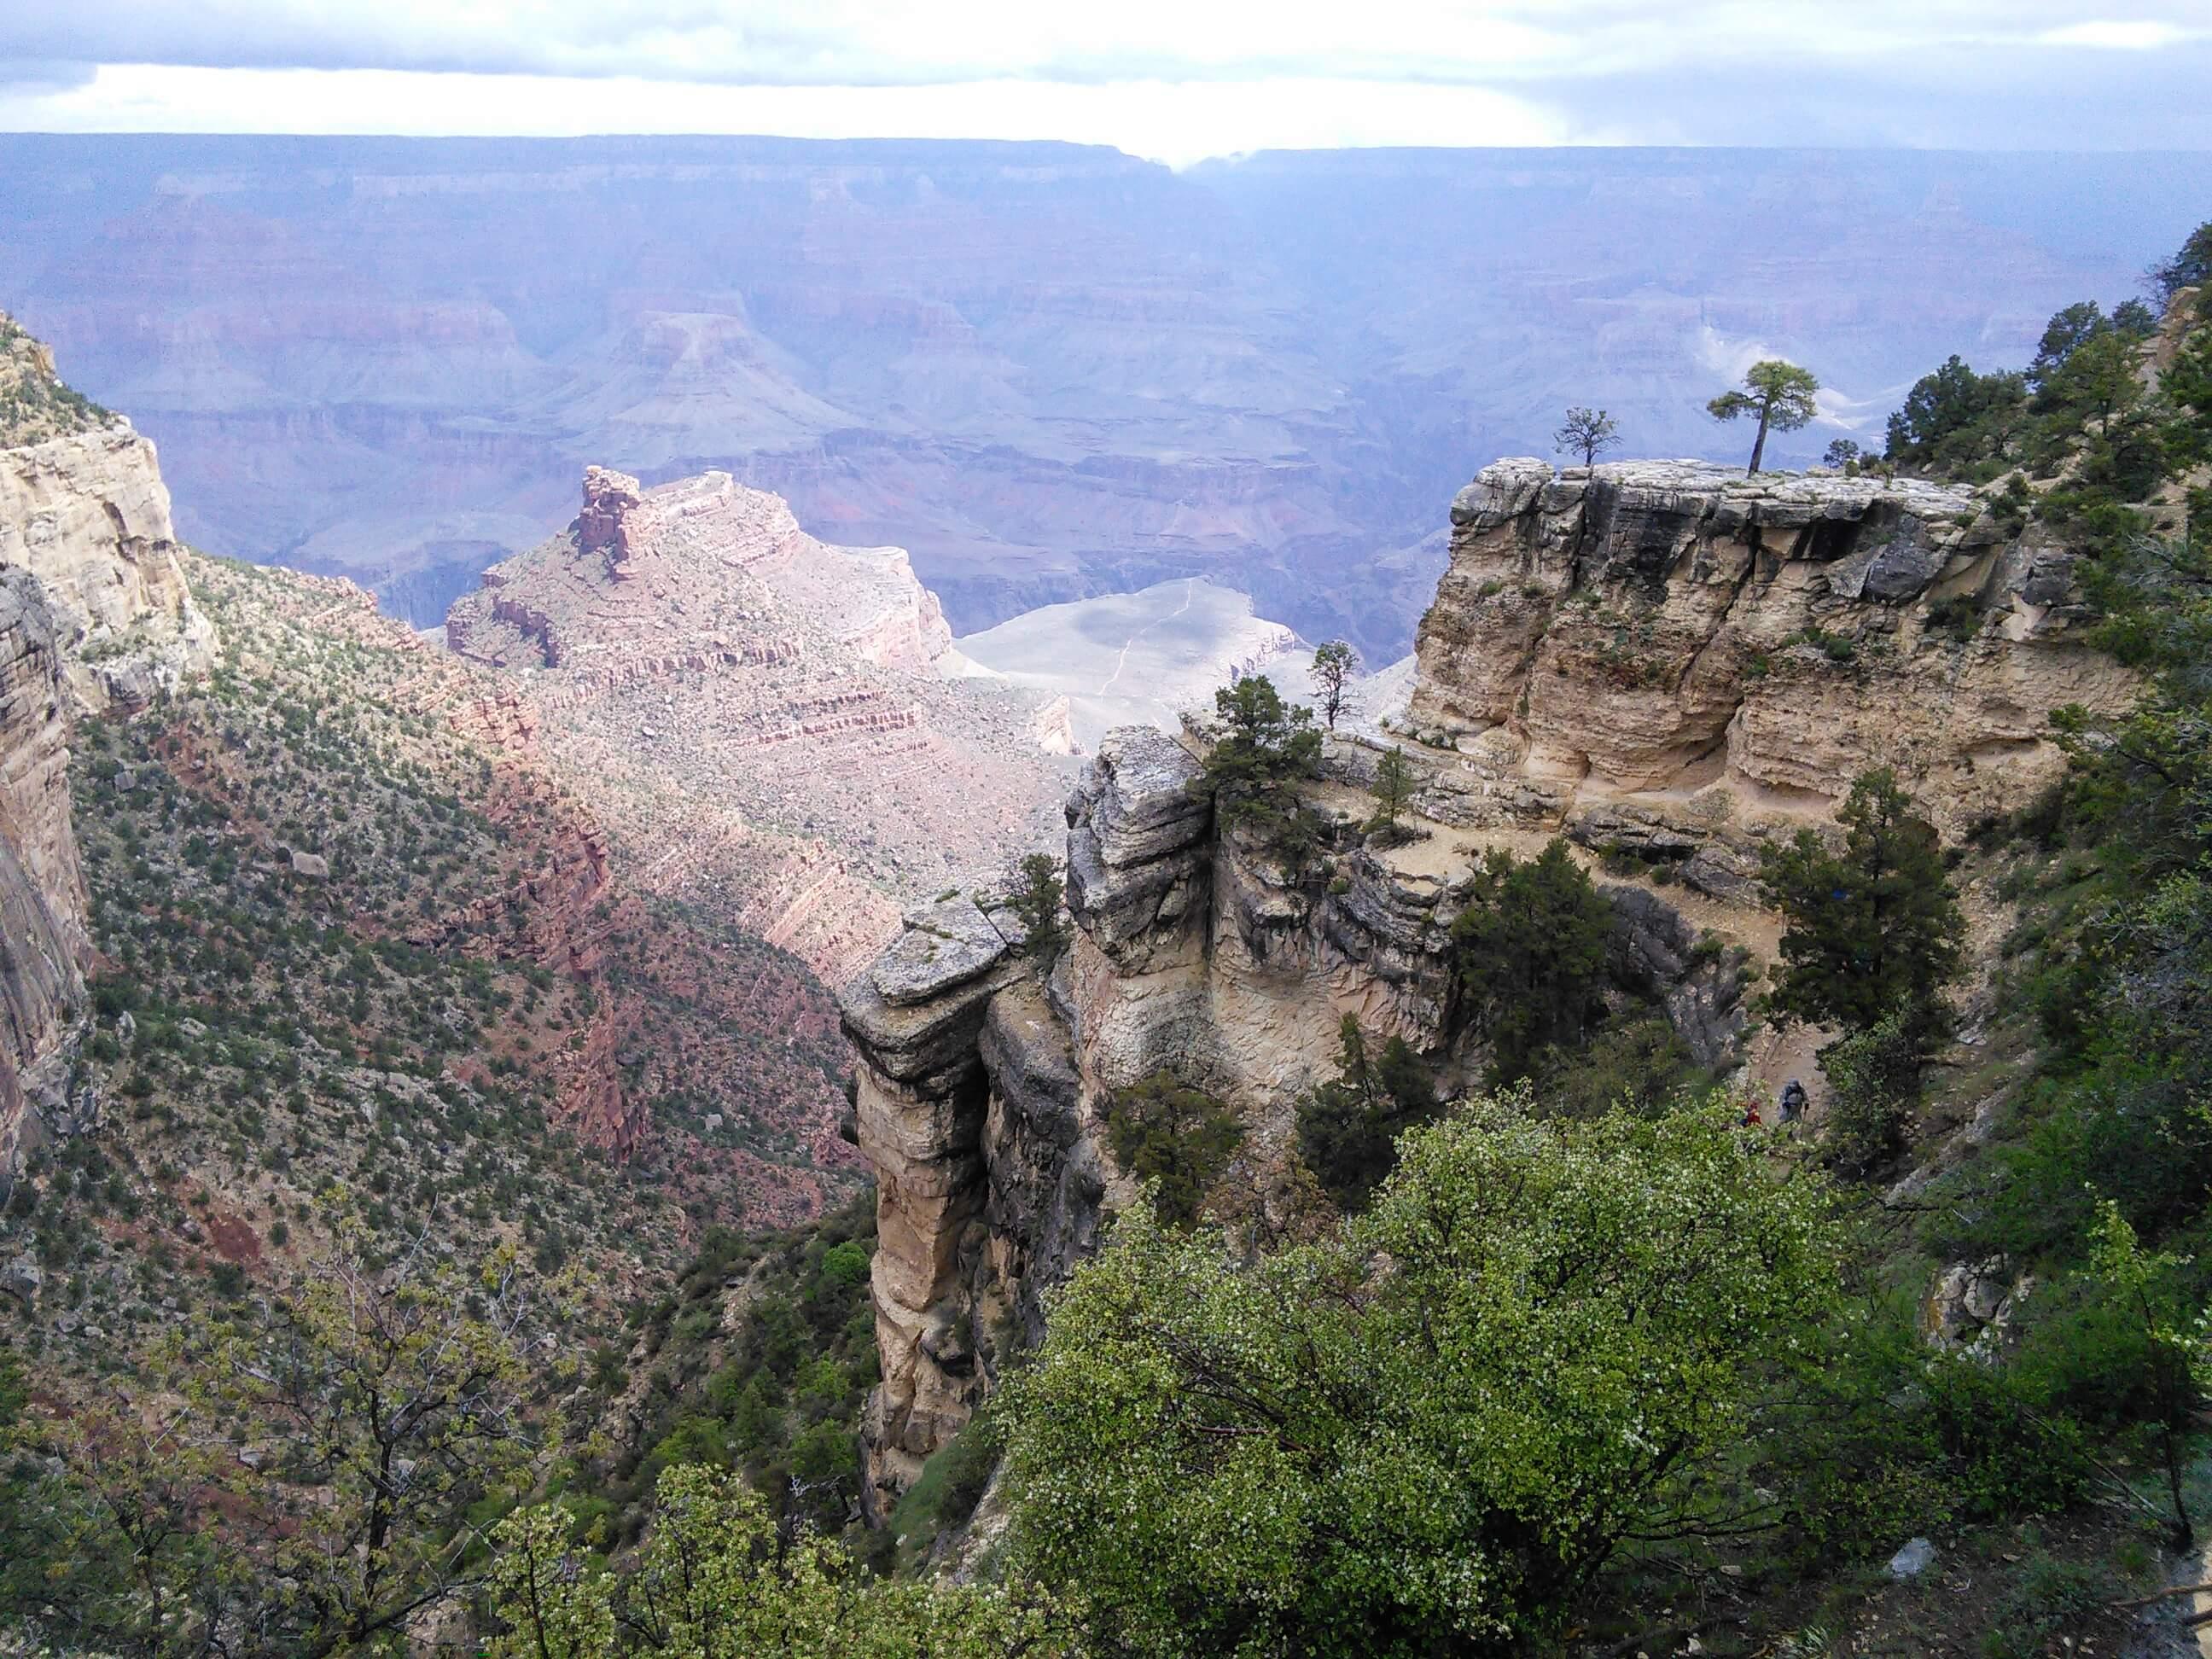 South Rim, Grand Canyon National Park, AZ